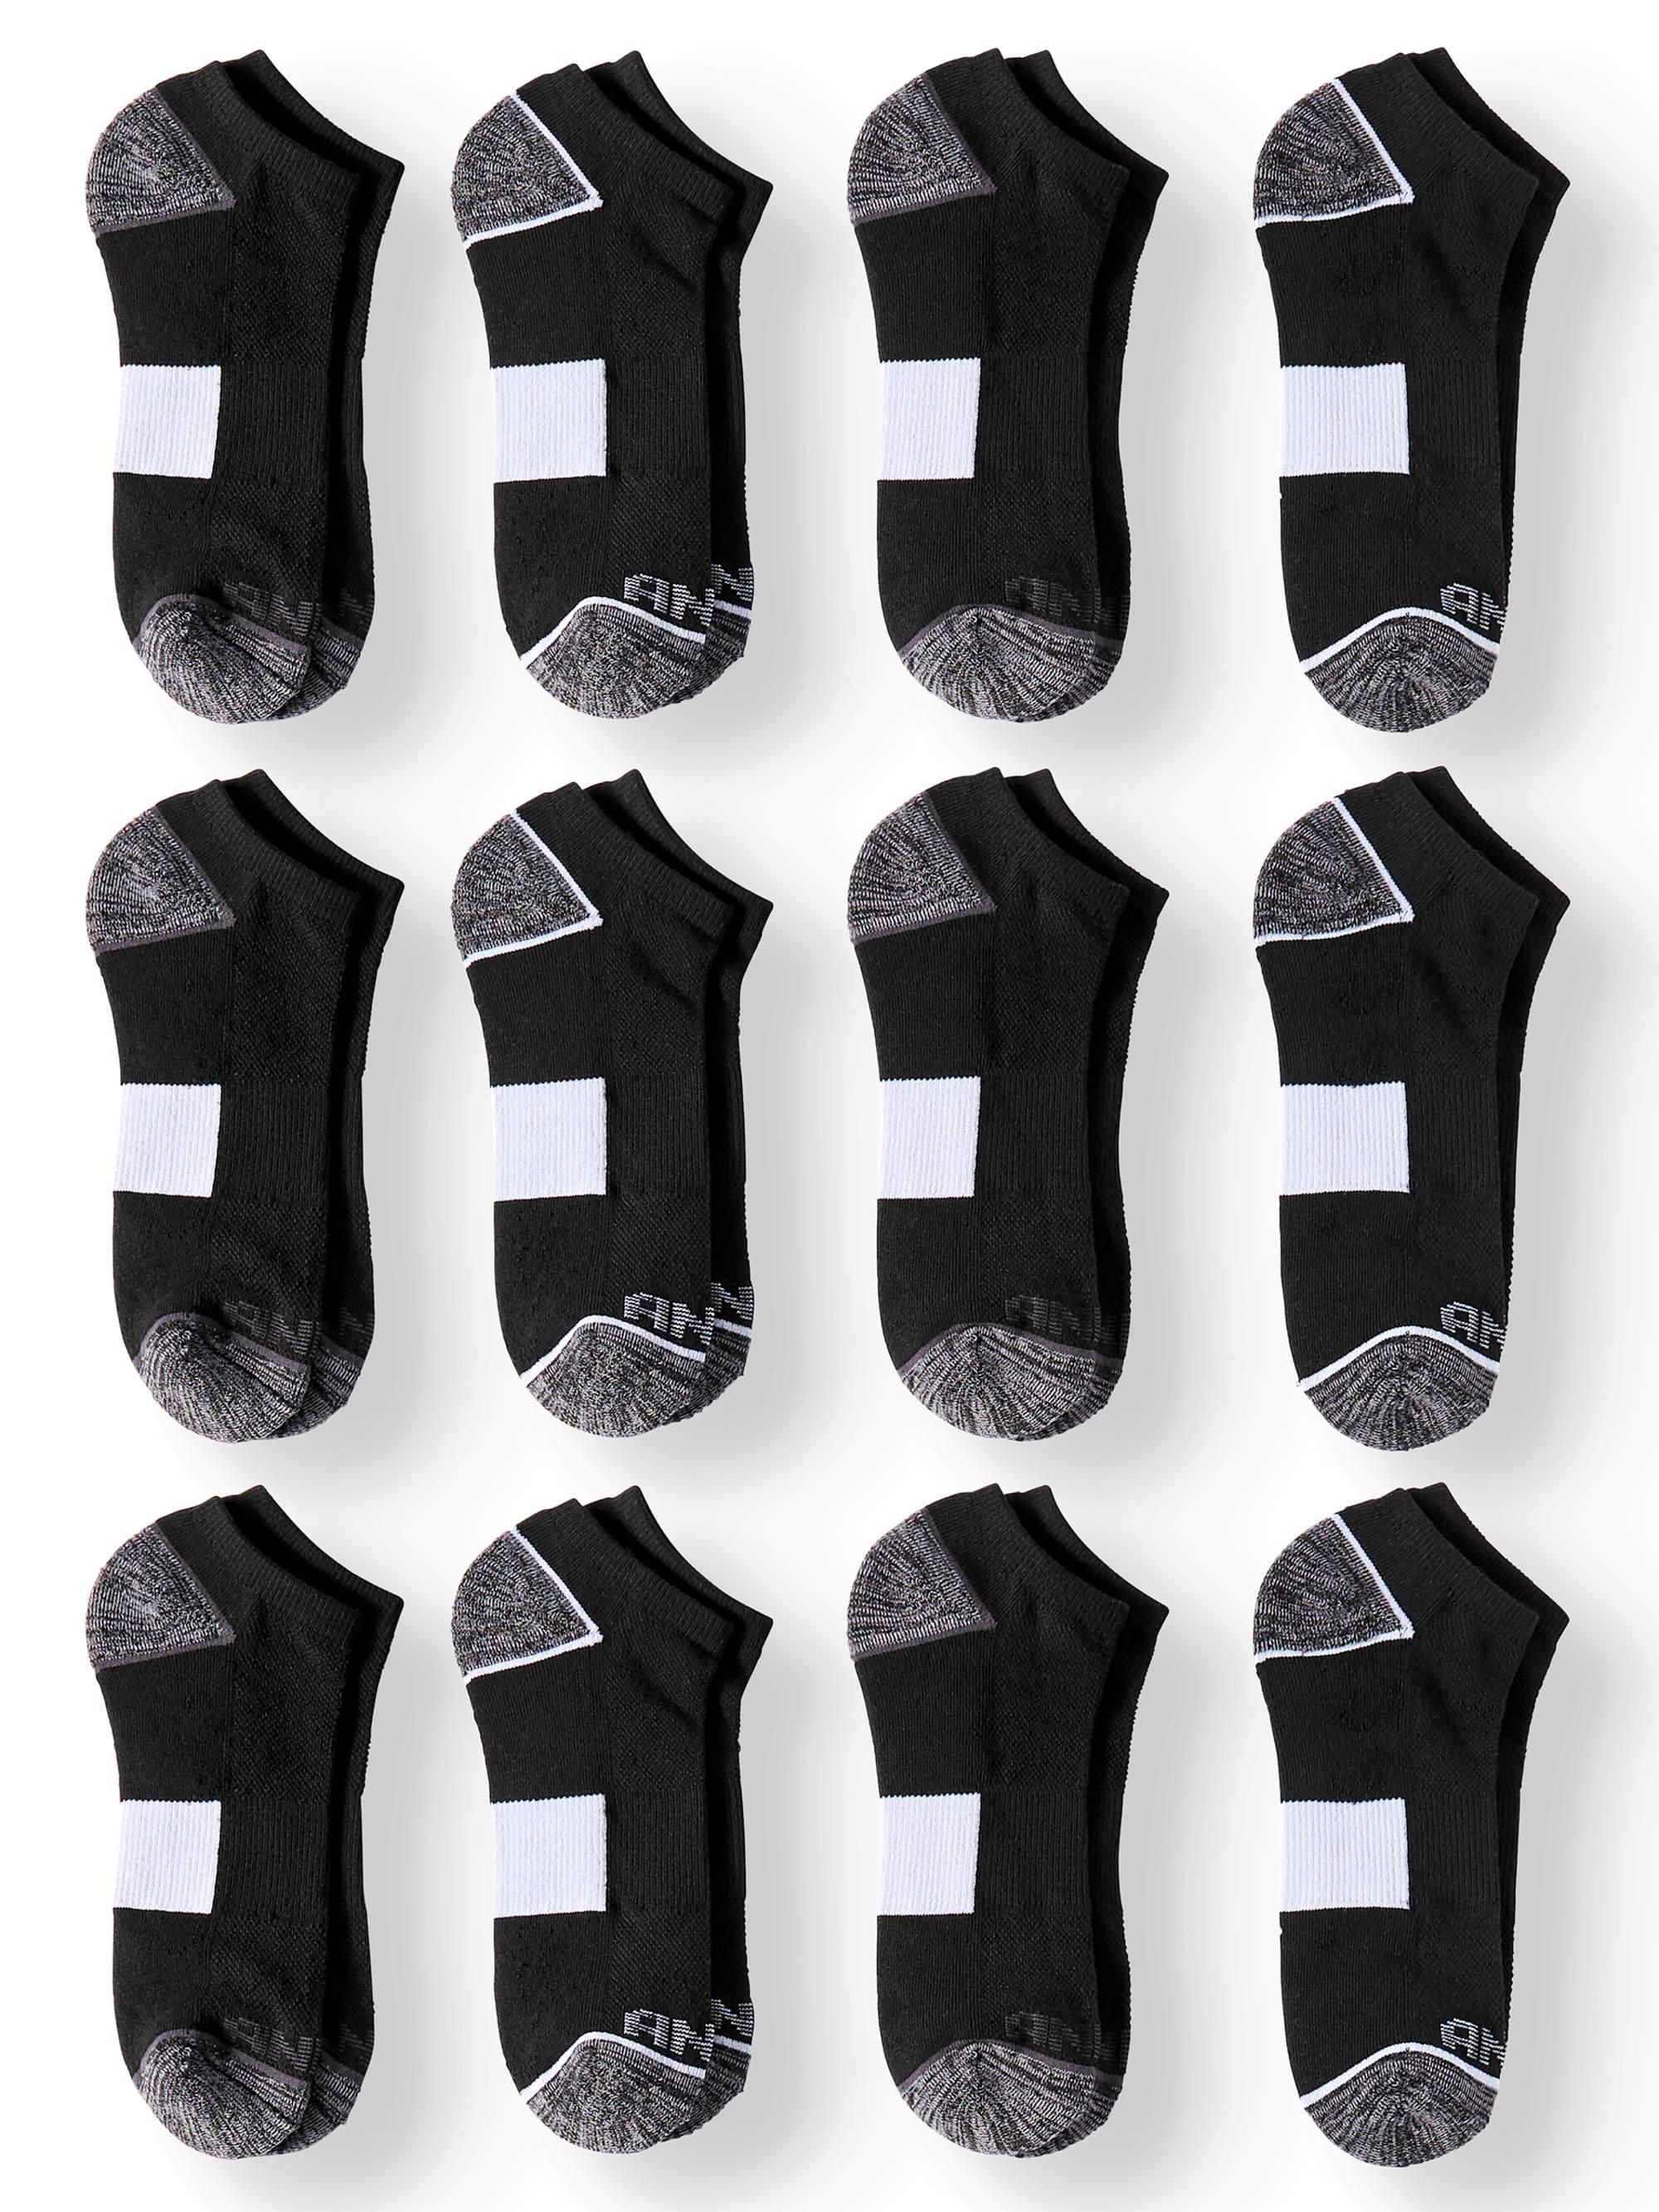 Men's Pro Platinum Low Cut Socks, 12 pack